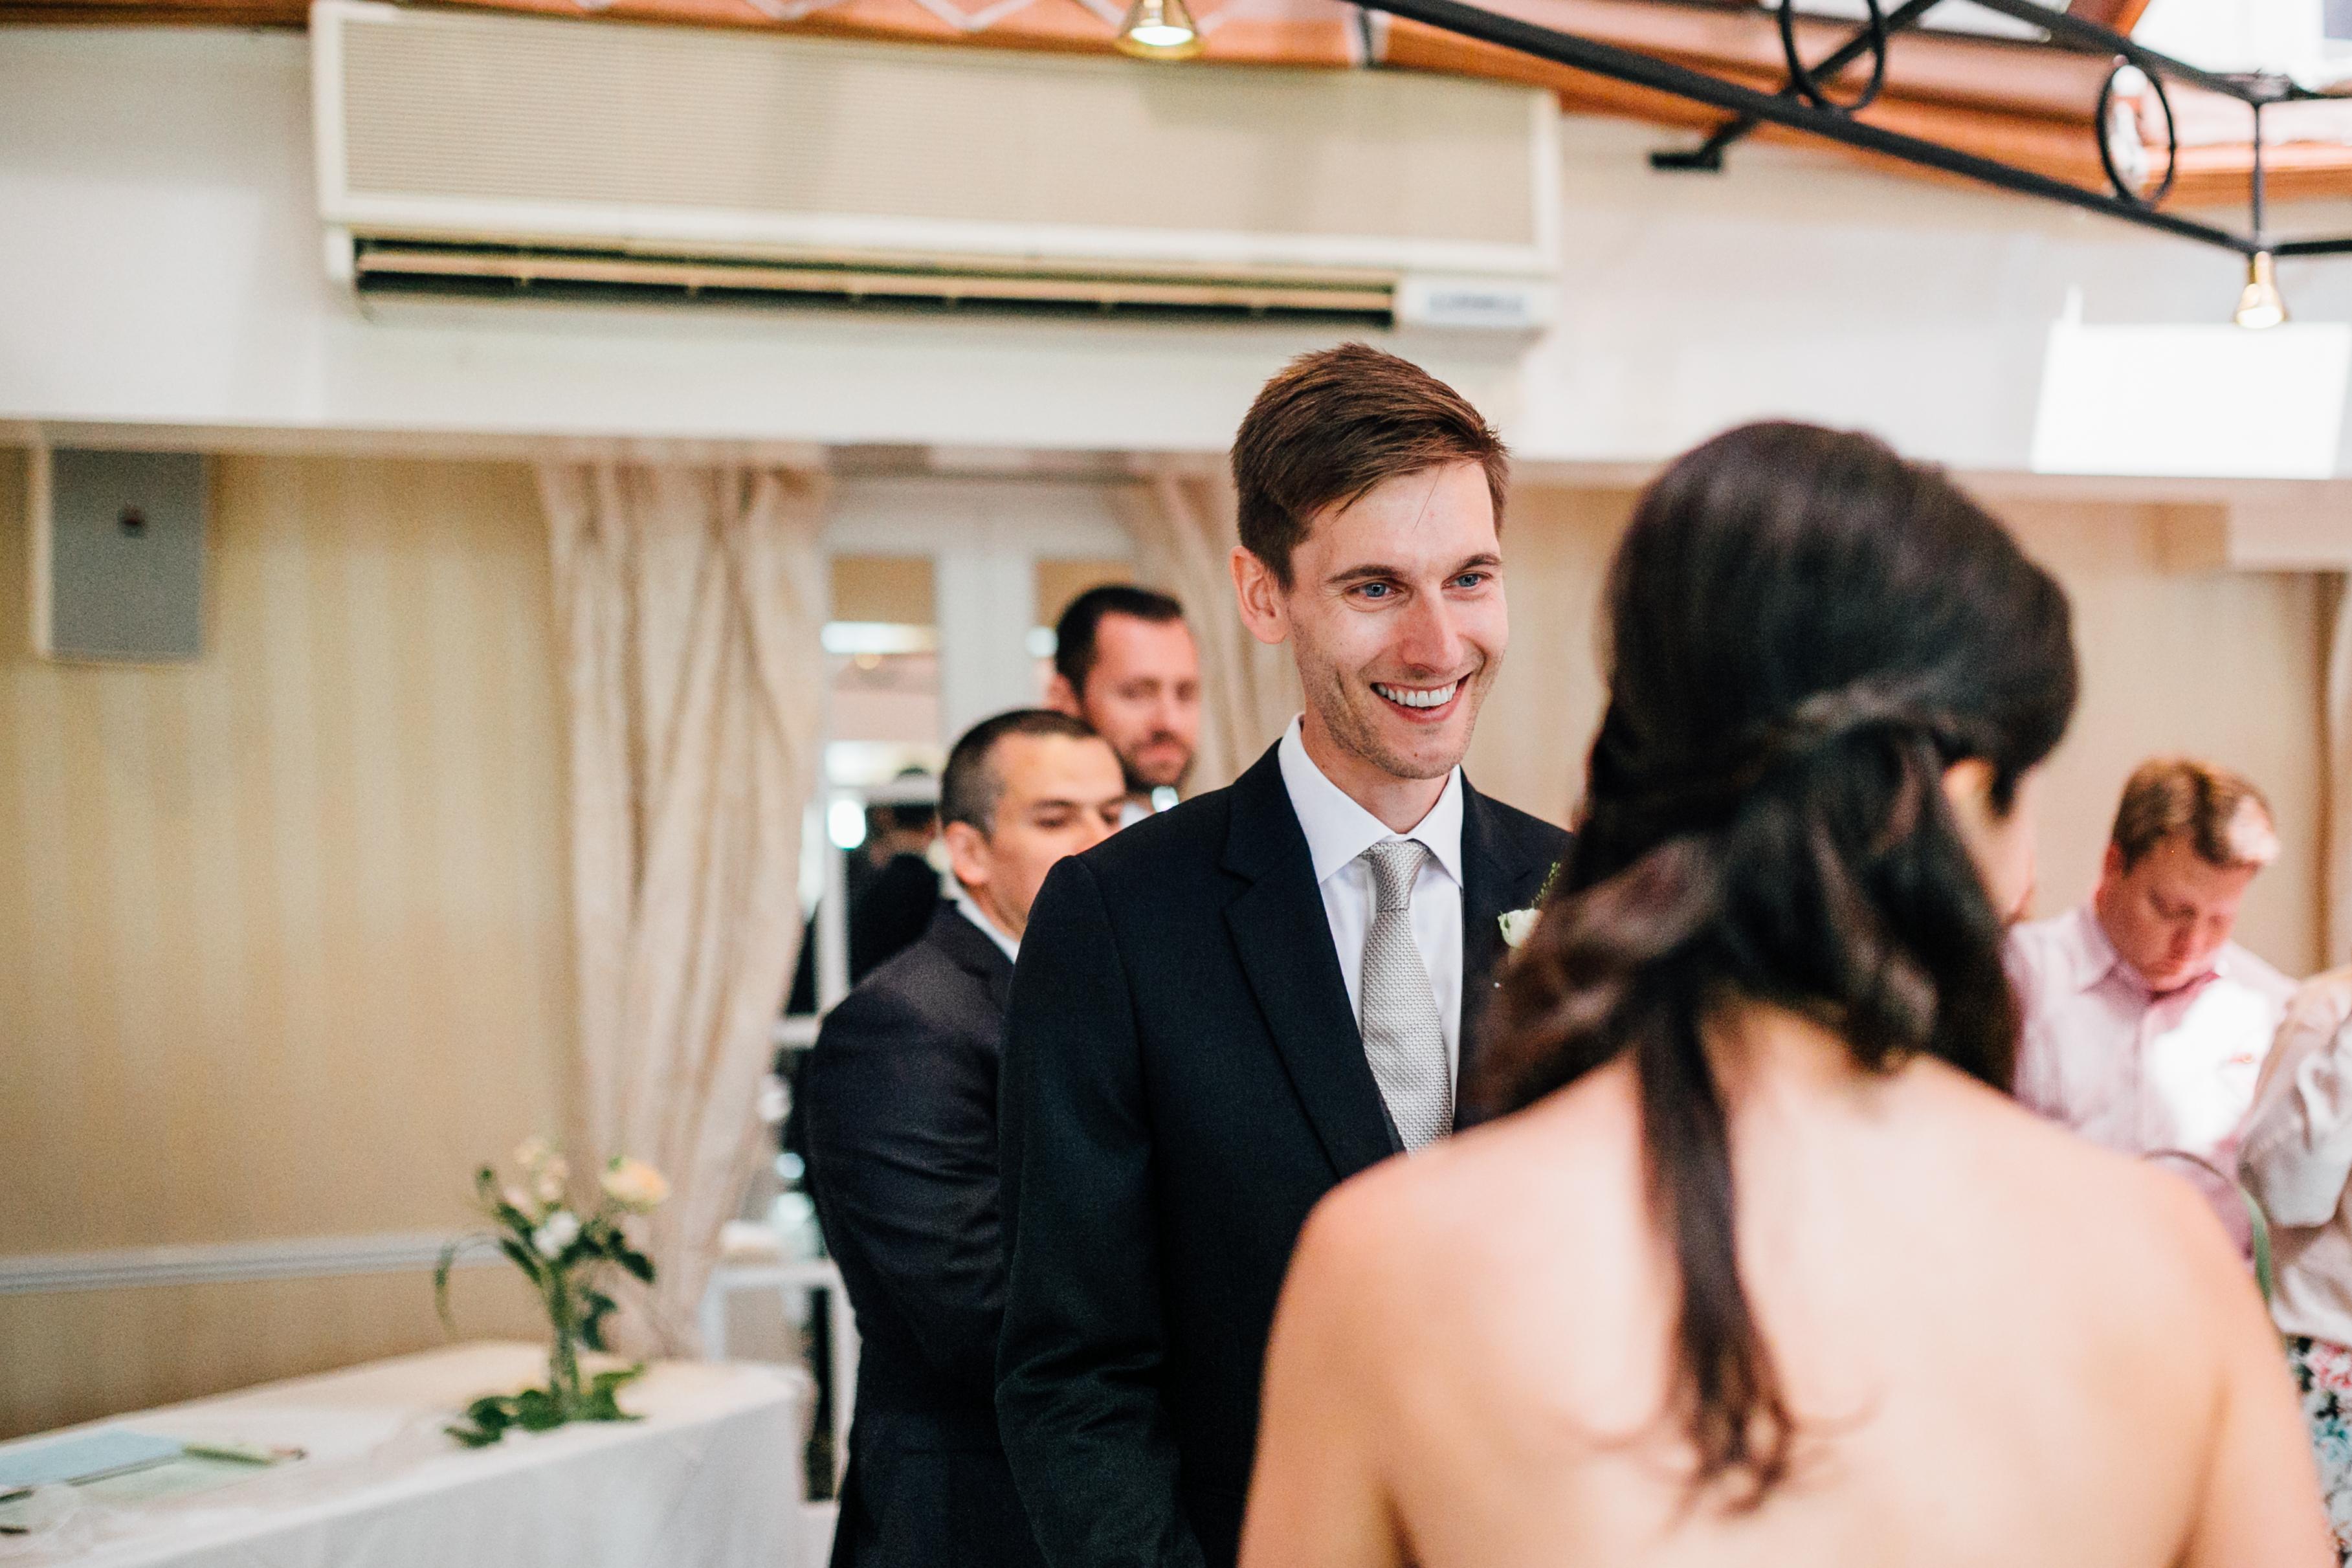 documentary wedding photography london and brighton